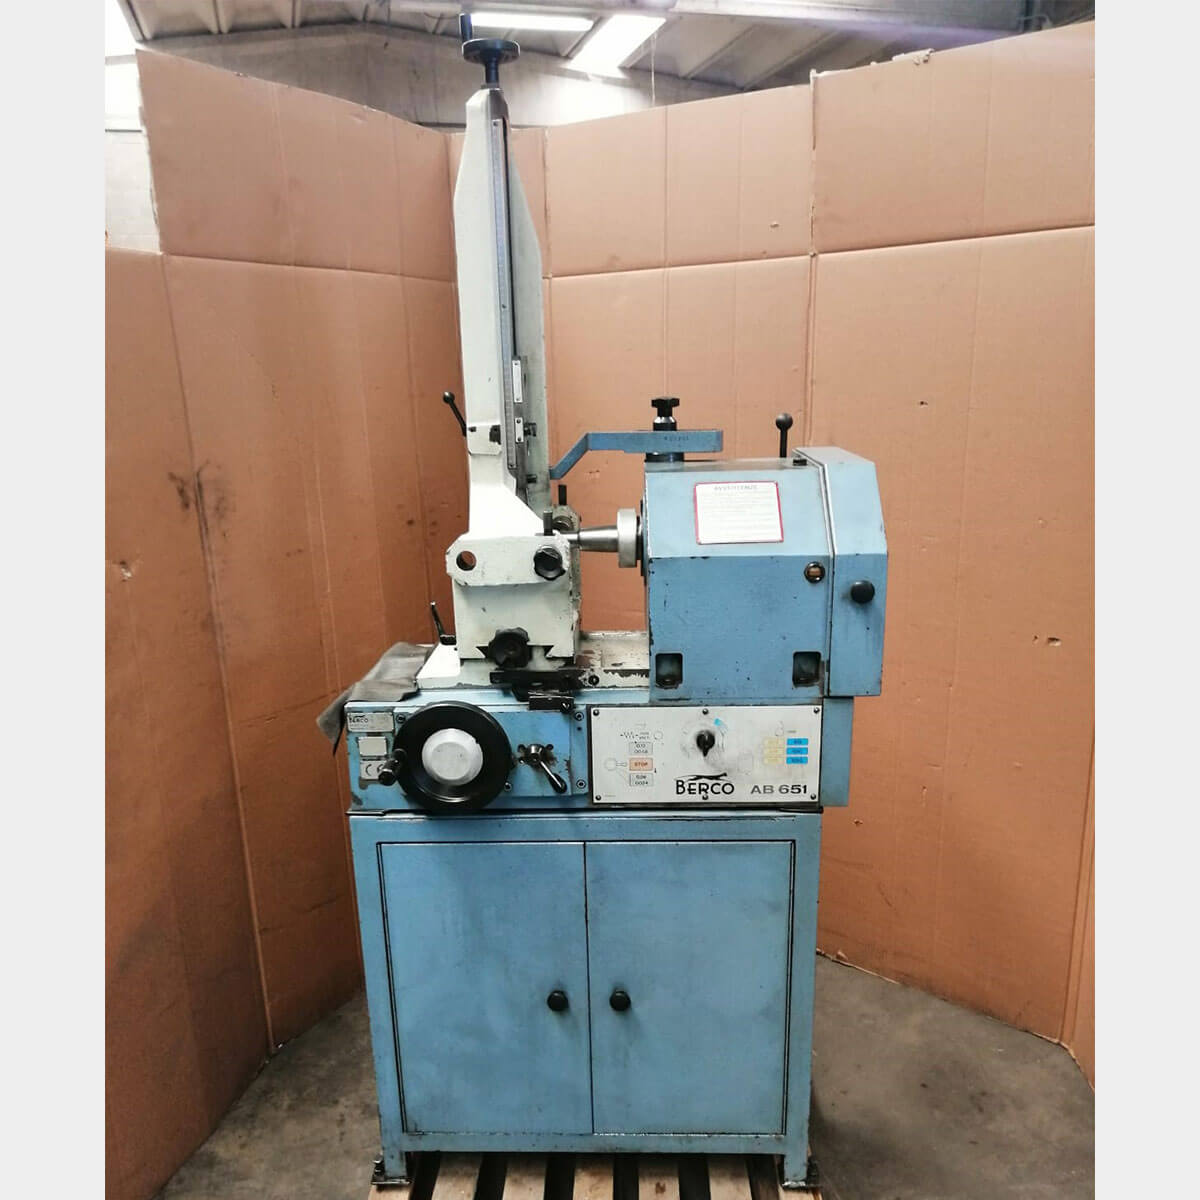 MU643 - BERCO AB 651 conrod grinding machine